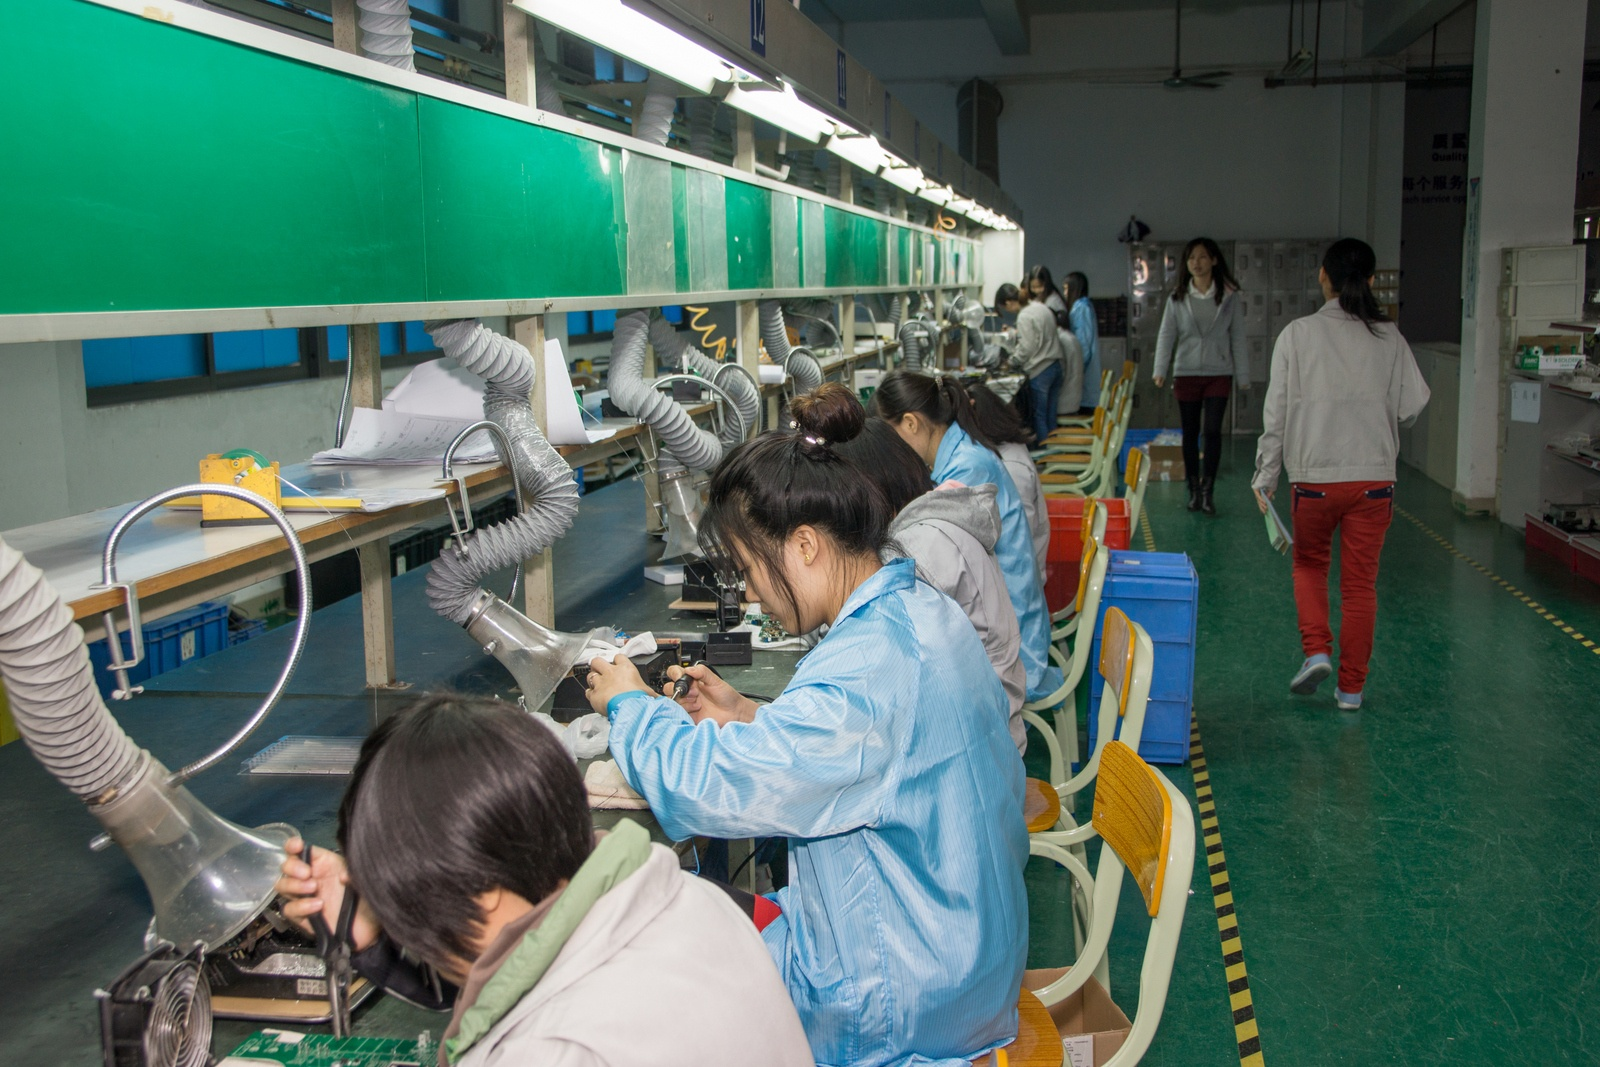 Китай. Завод устройств для «Умного дома». Учимся и учим - 32